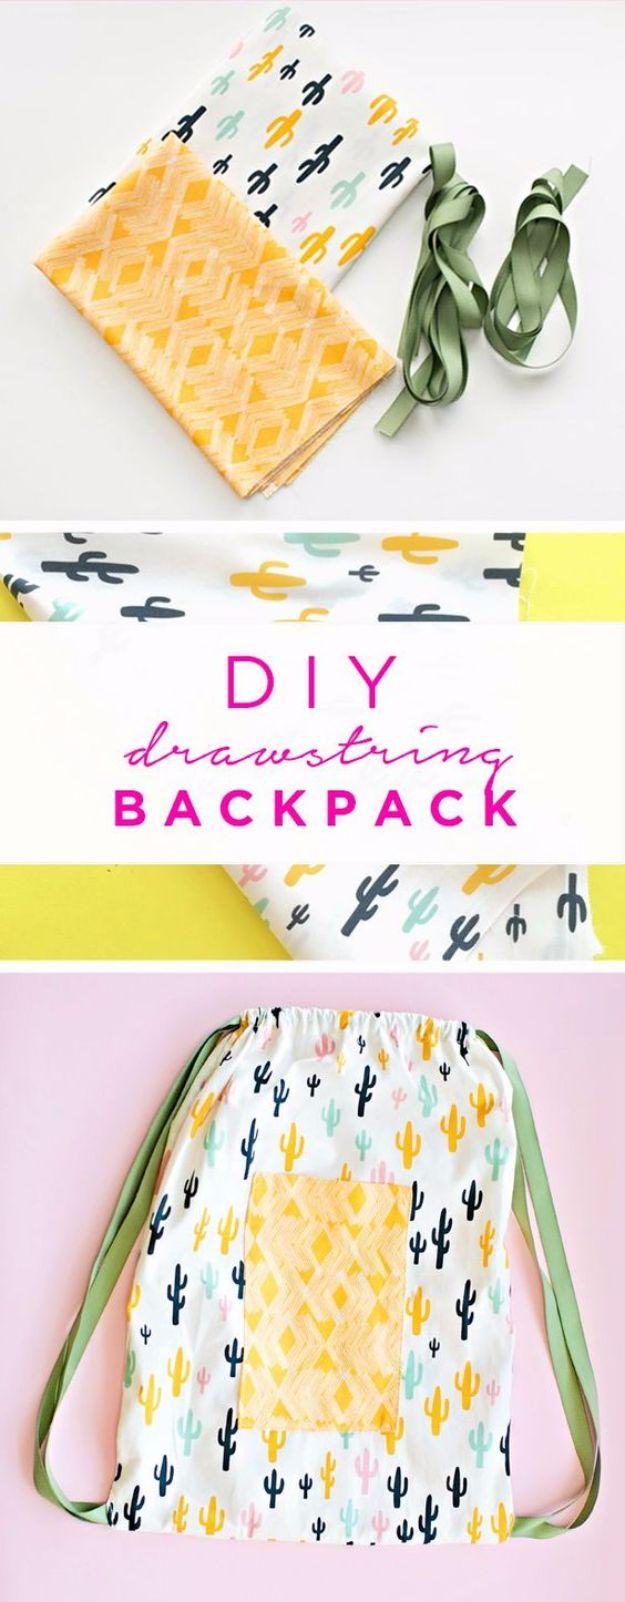 50 besten zurück zu Schule DIY-Ideen